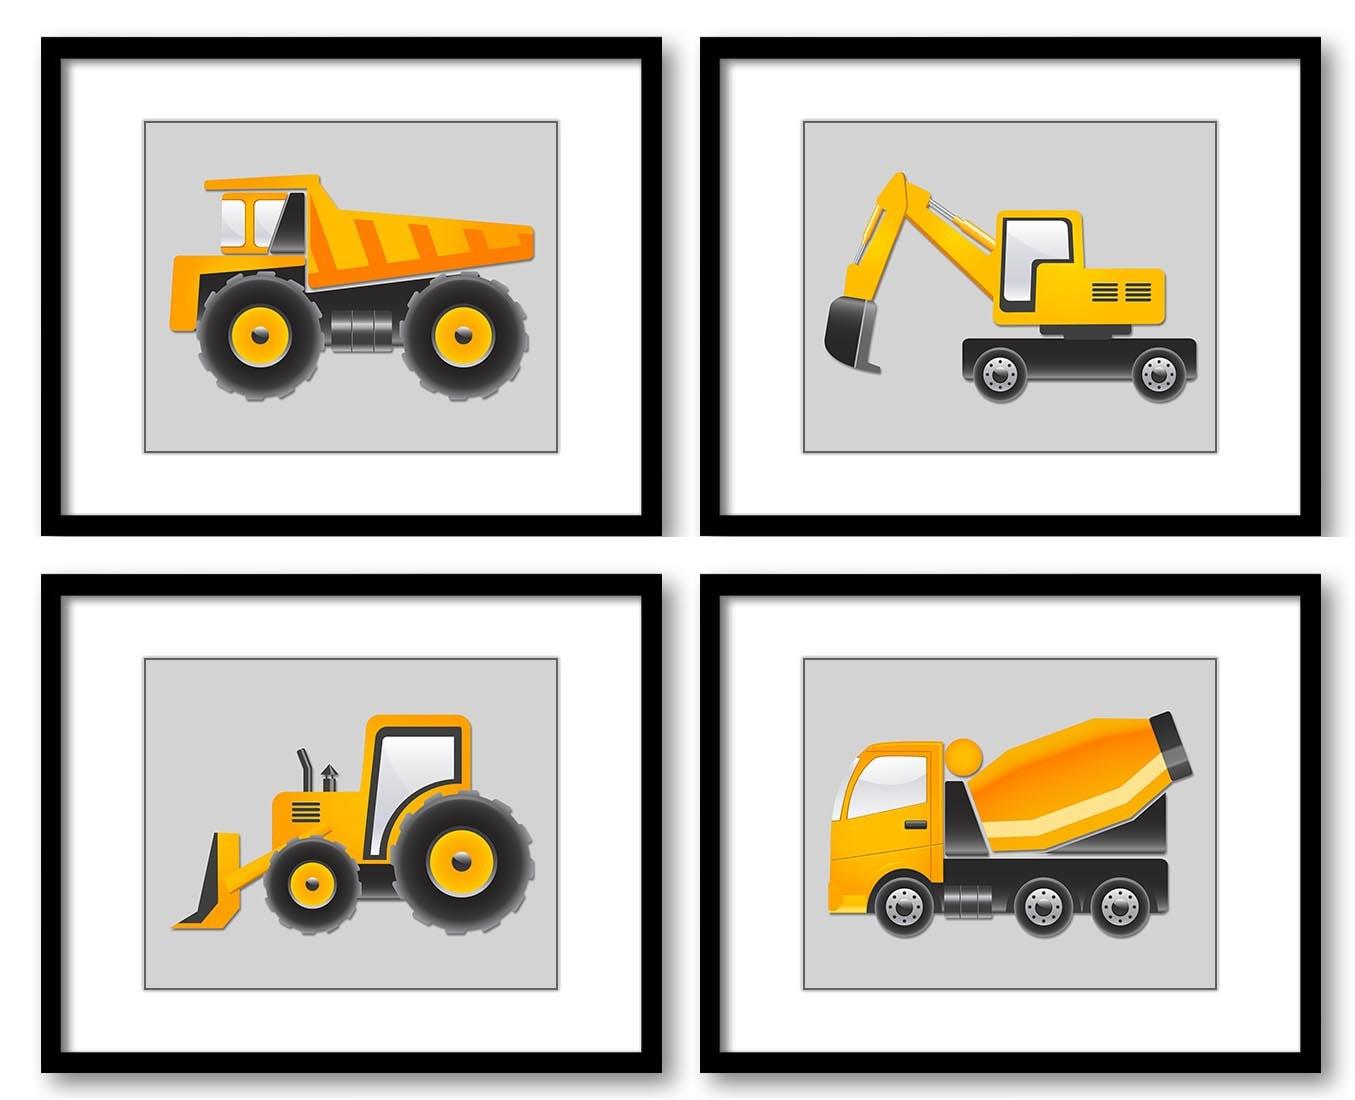 Light Grey Yellow Transportation Construction Vehicles Heavy Machinery Child Set of 4 Prints Boy Nur